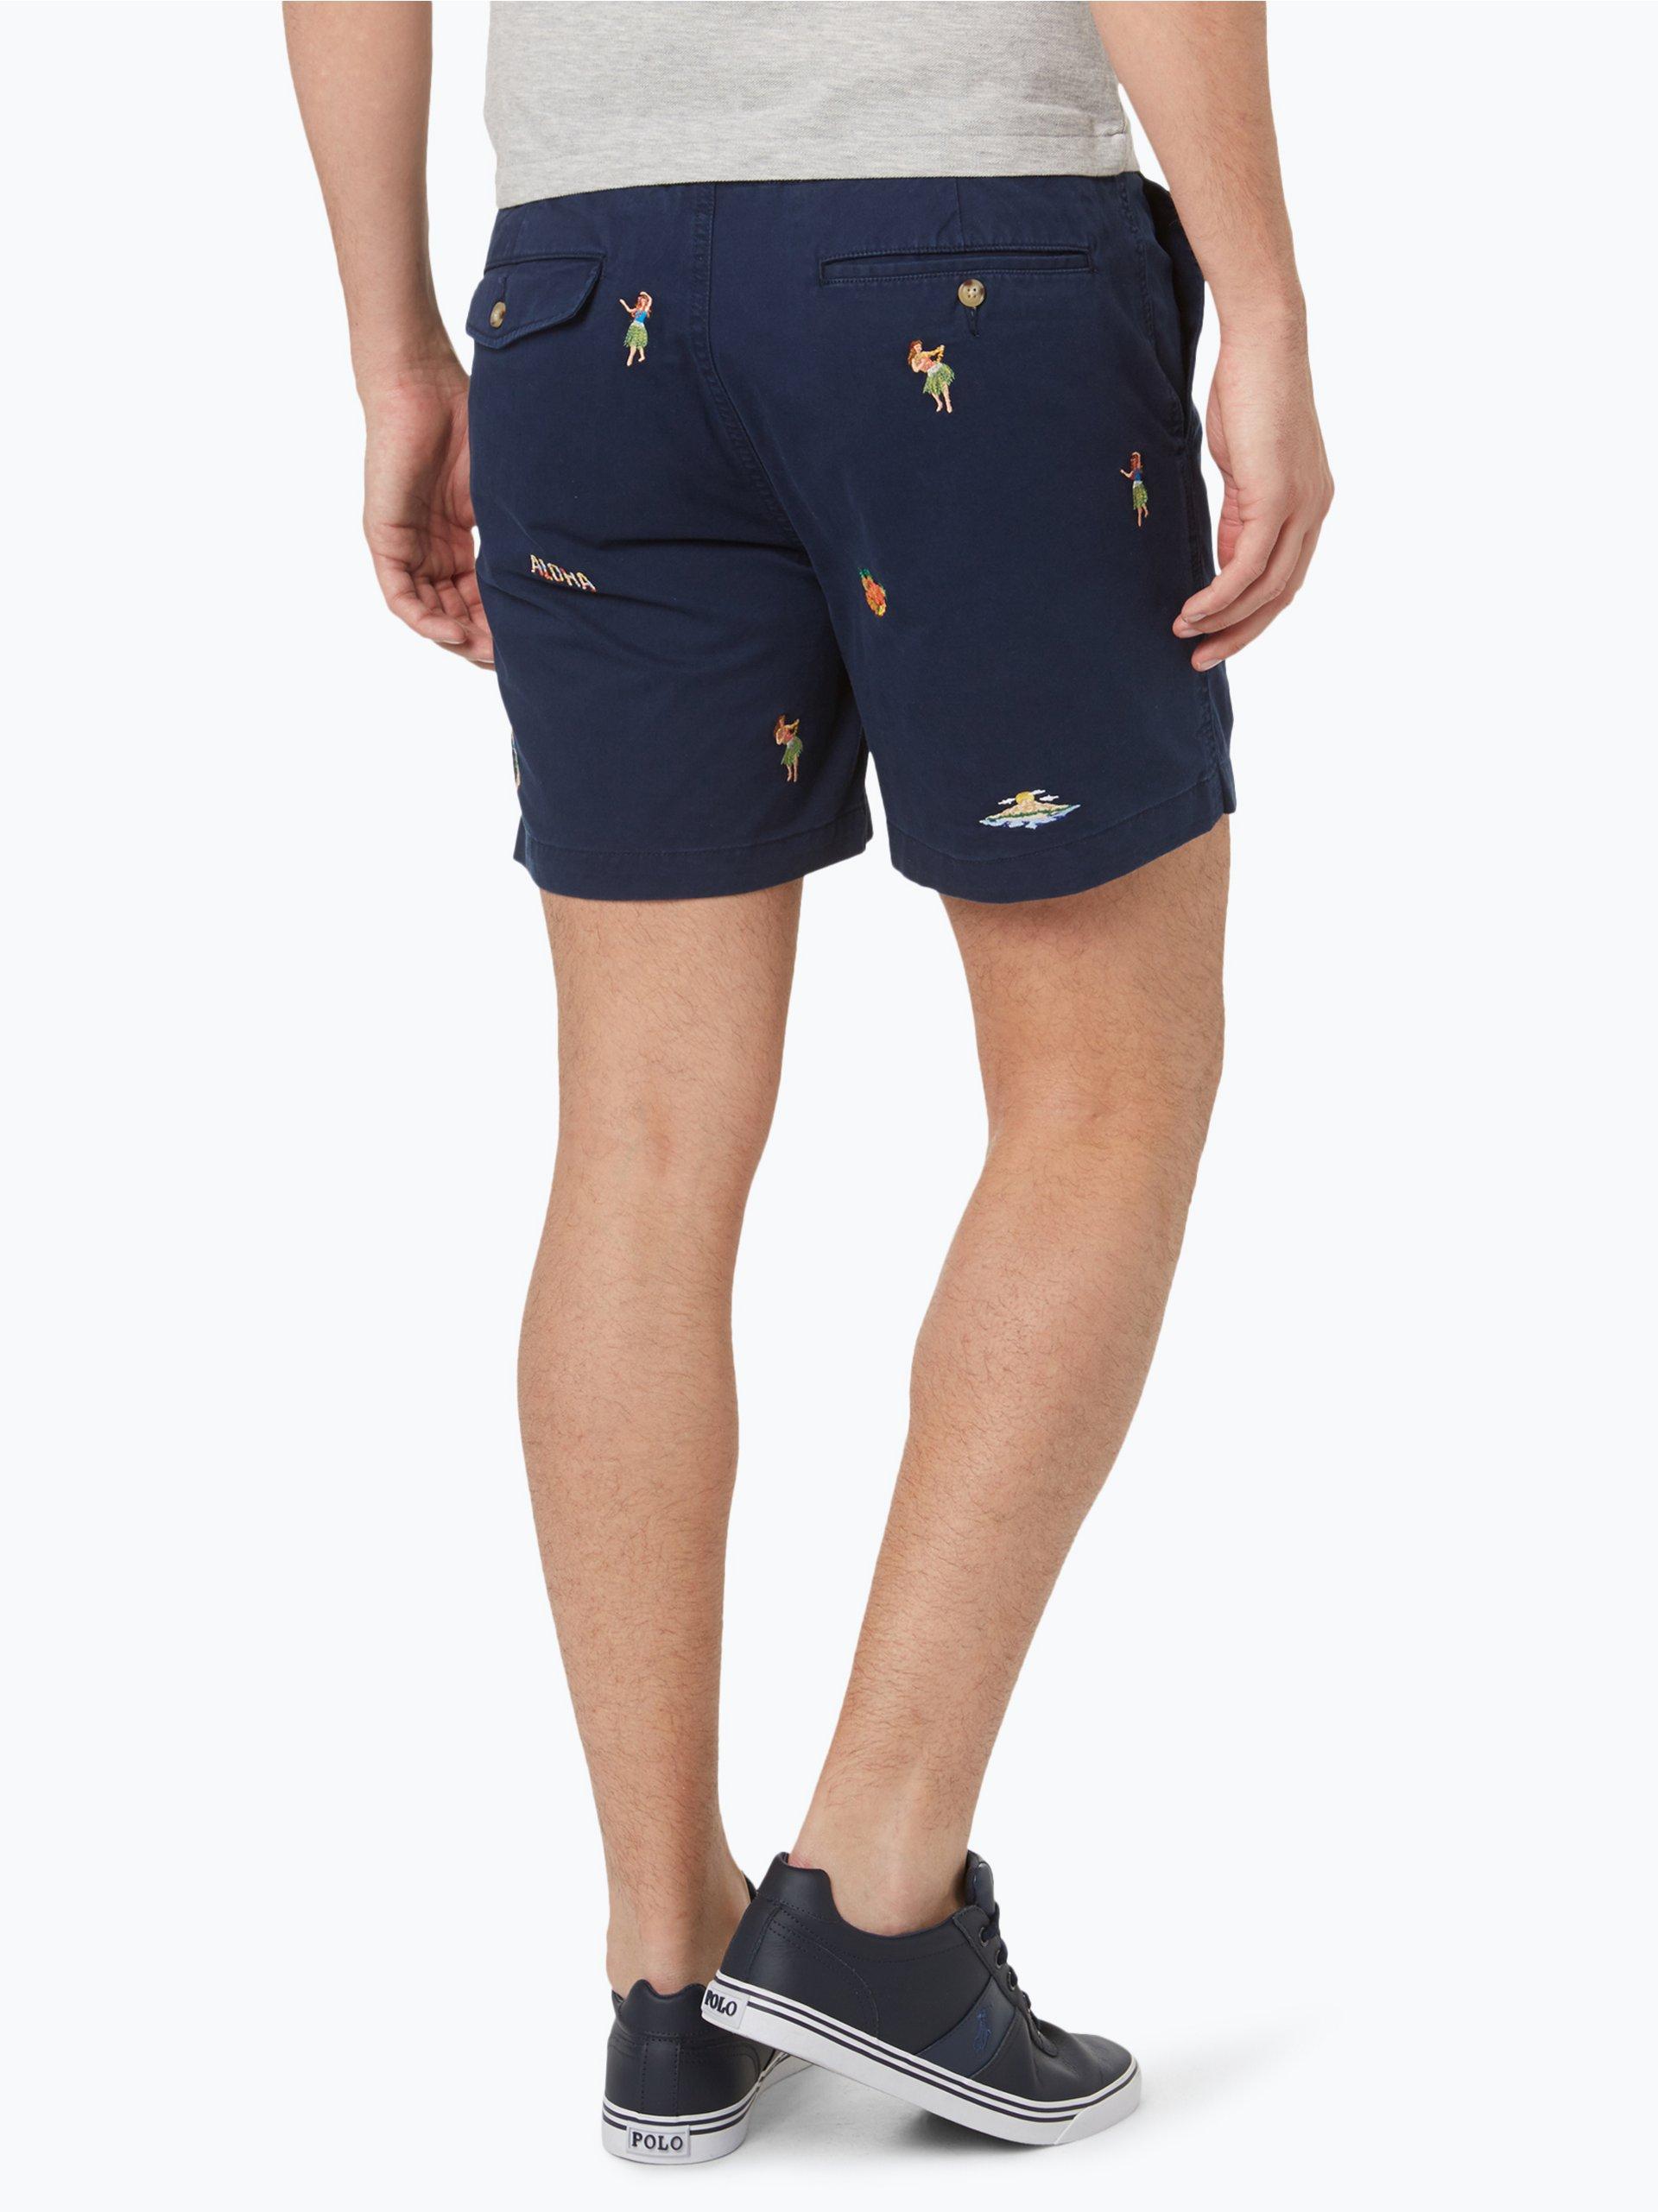 polo ralph lauren herren shorts marine uni online kaufen. Black Bedroom Furniture Sets. Home Design Ideas